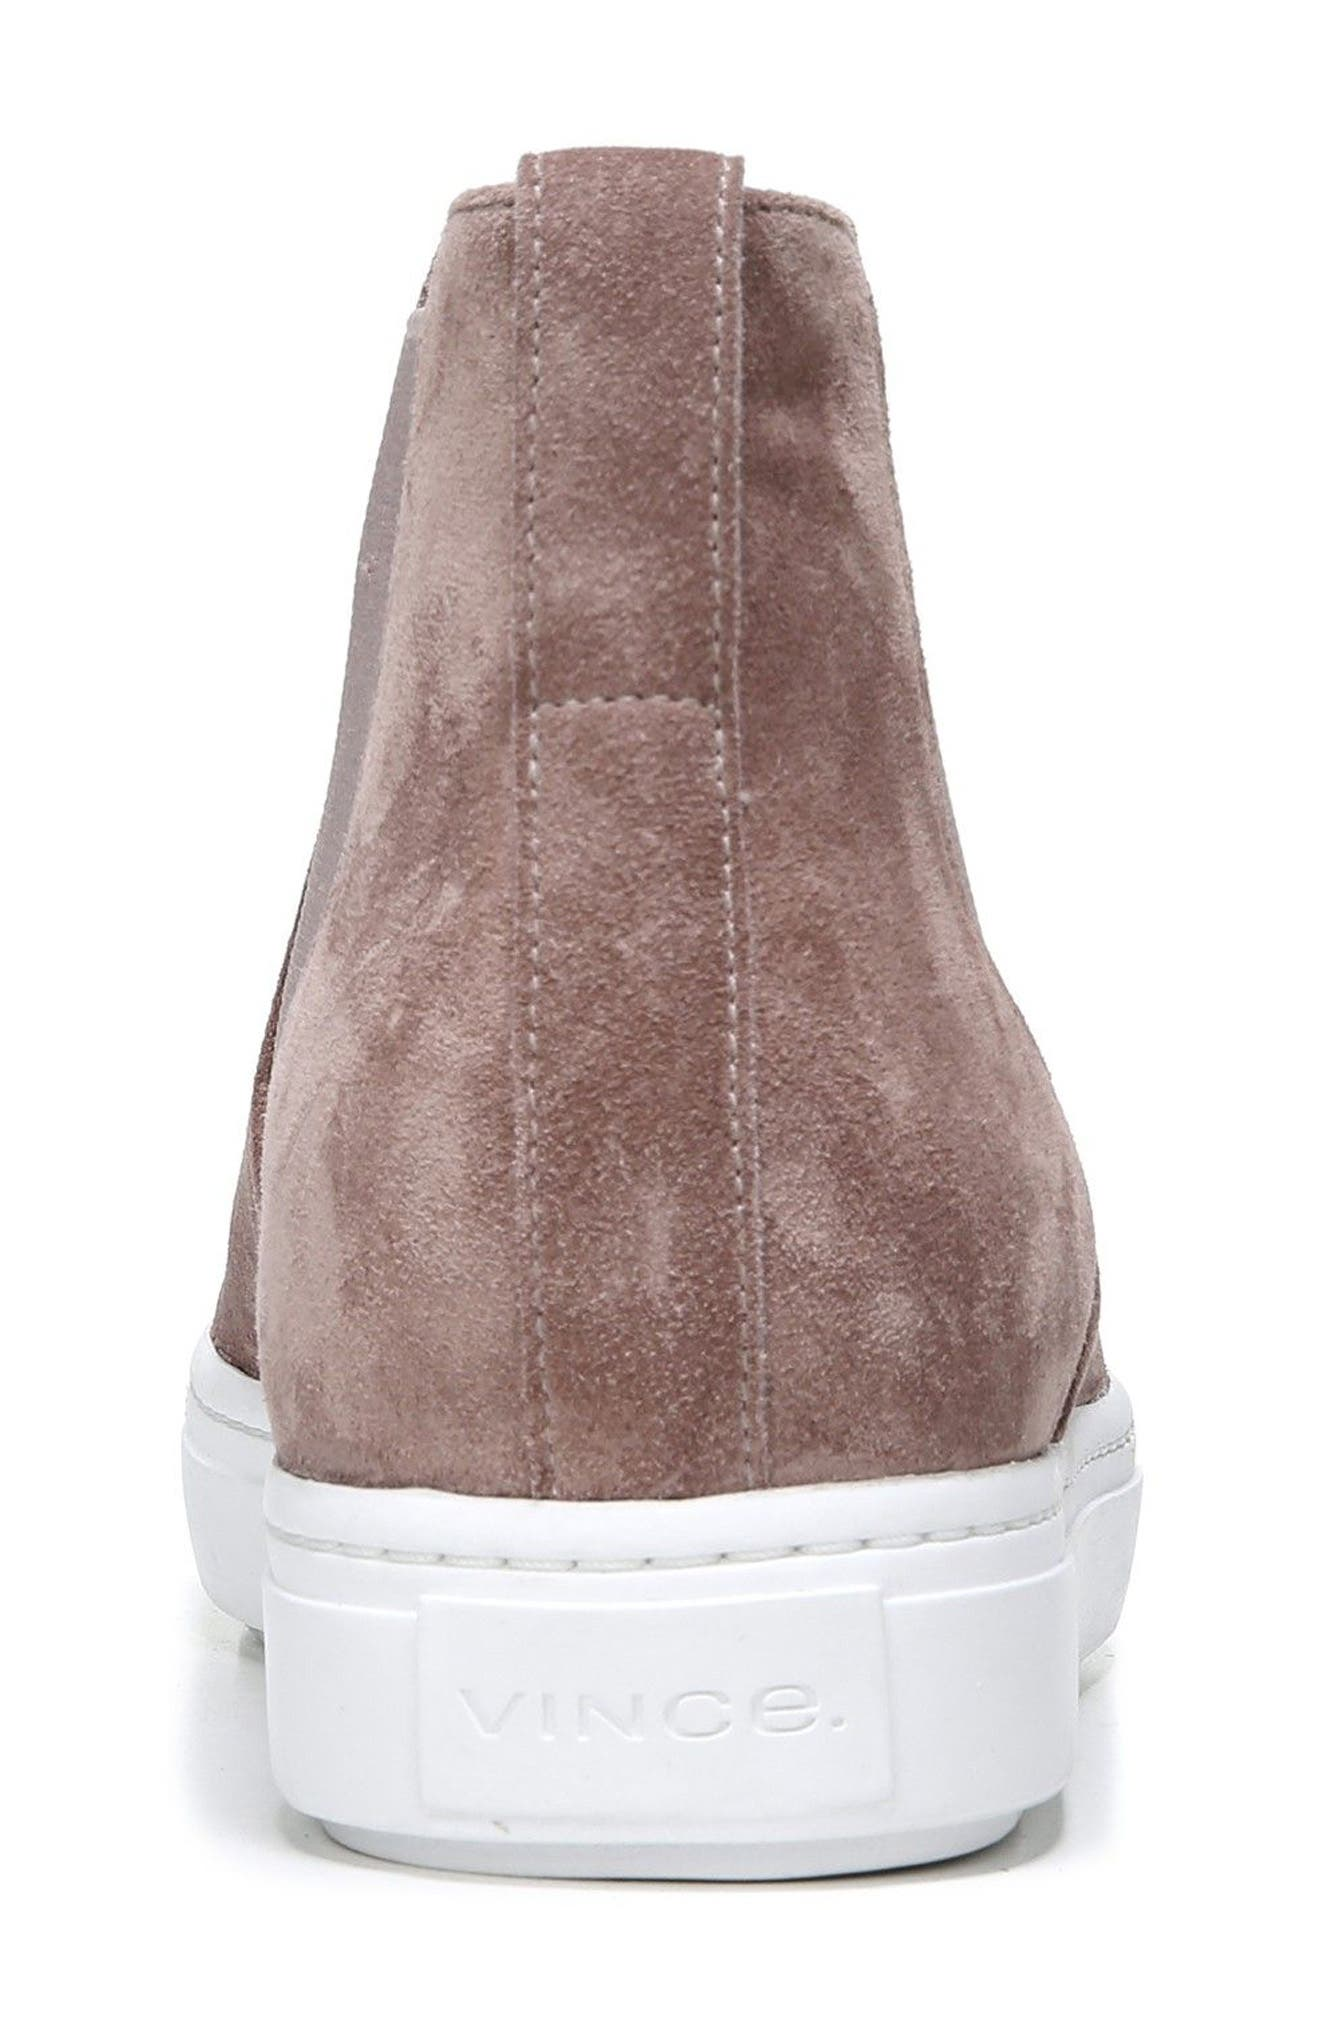 Newlyn High Top Sneaker,                             Alternate thumbnail 15, color,